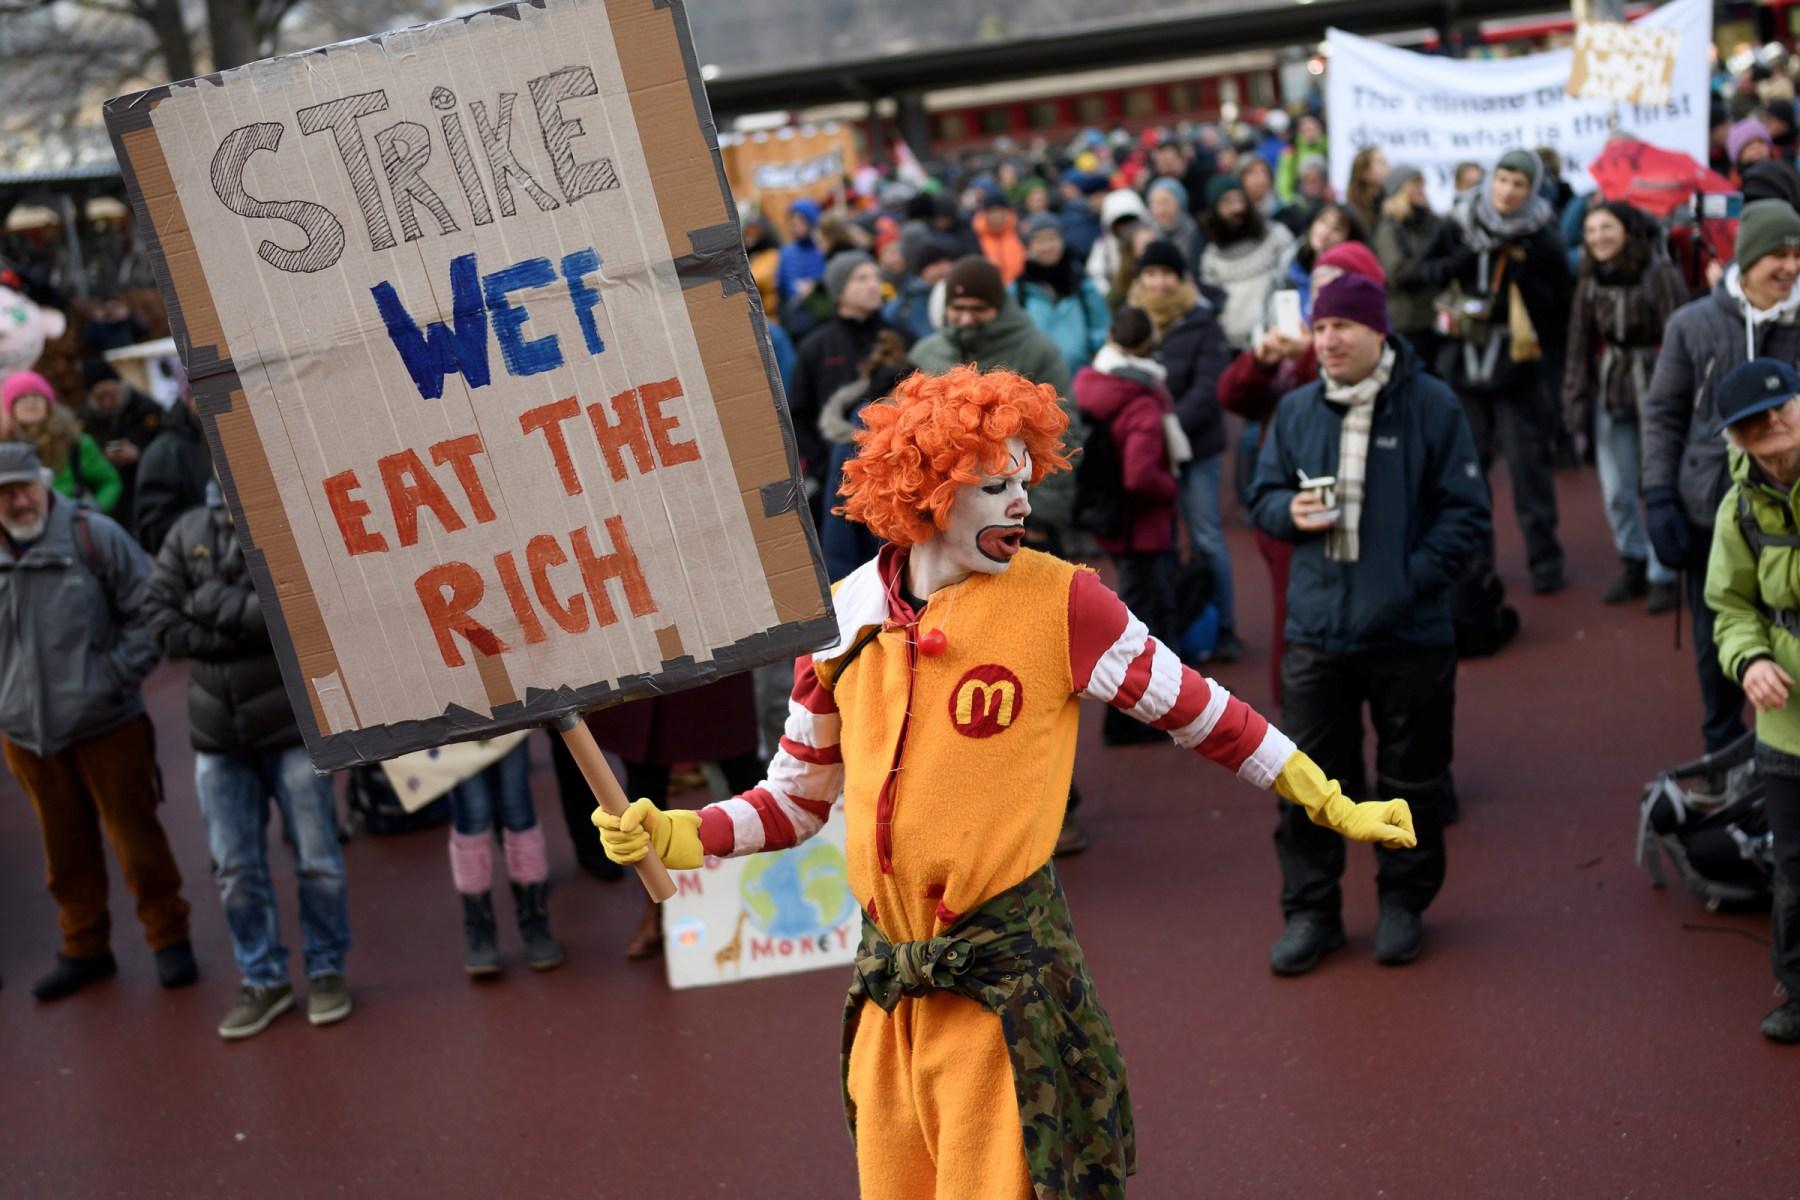 World Economic Forum 2020: Protestors Block Road to Davos - Rolling Stone